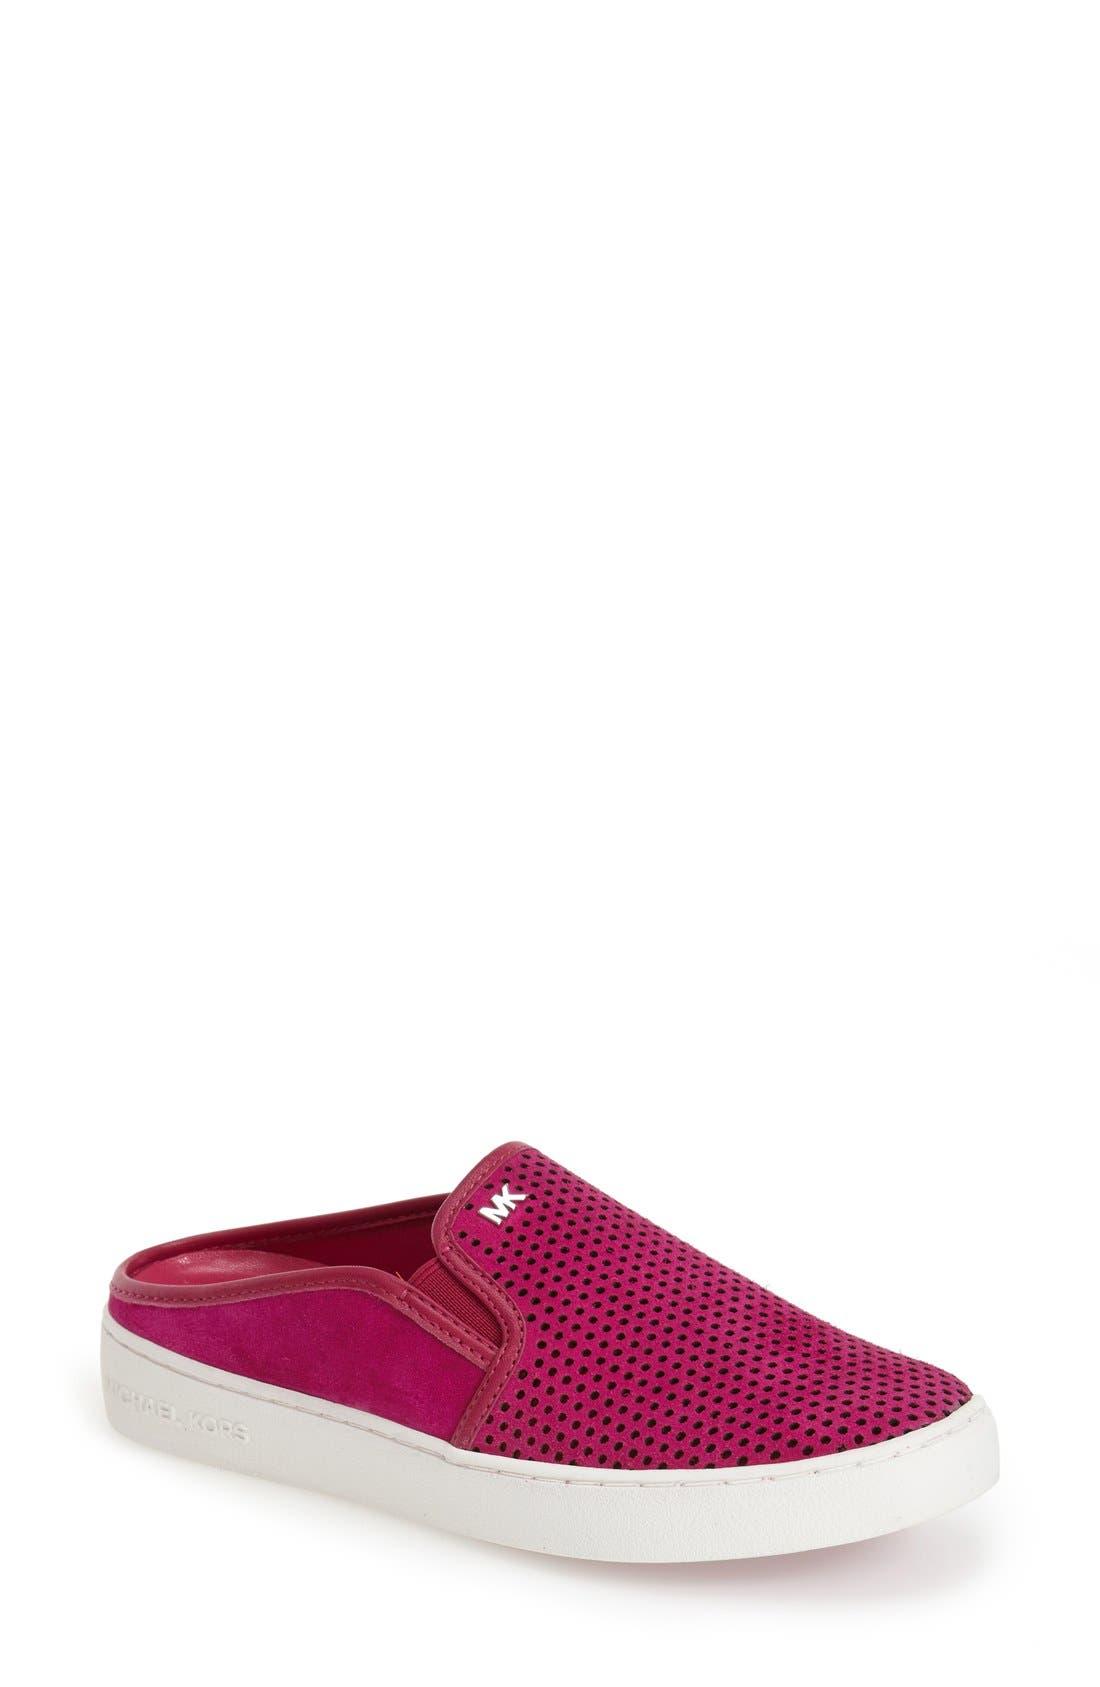 Main Image - MICHAEL Michael Kors 'Brett' Perforated Slip-On Mule Sneaker (Women)